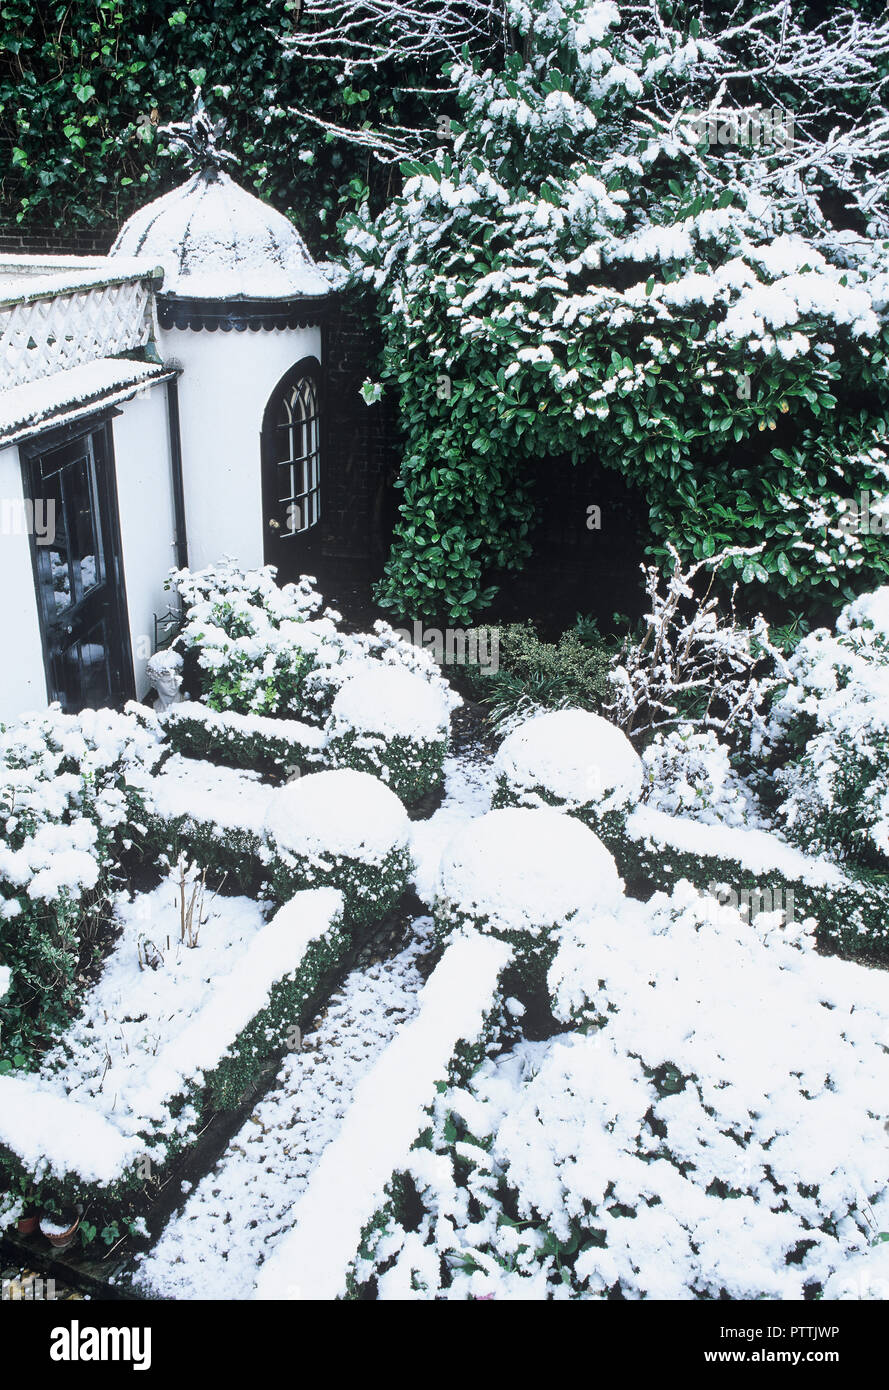 Victorian summerhouse and garden under snow - Stock Image